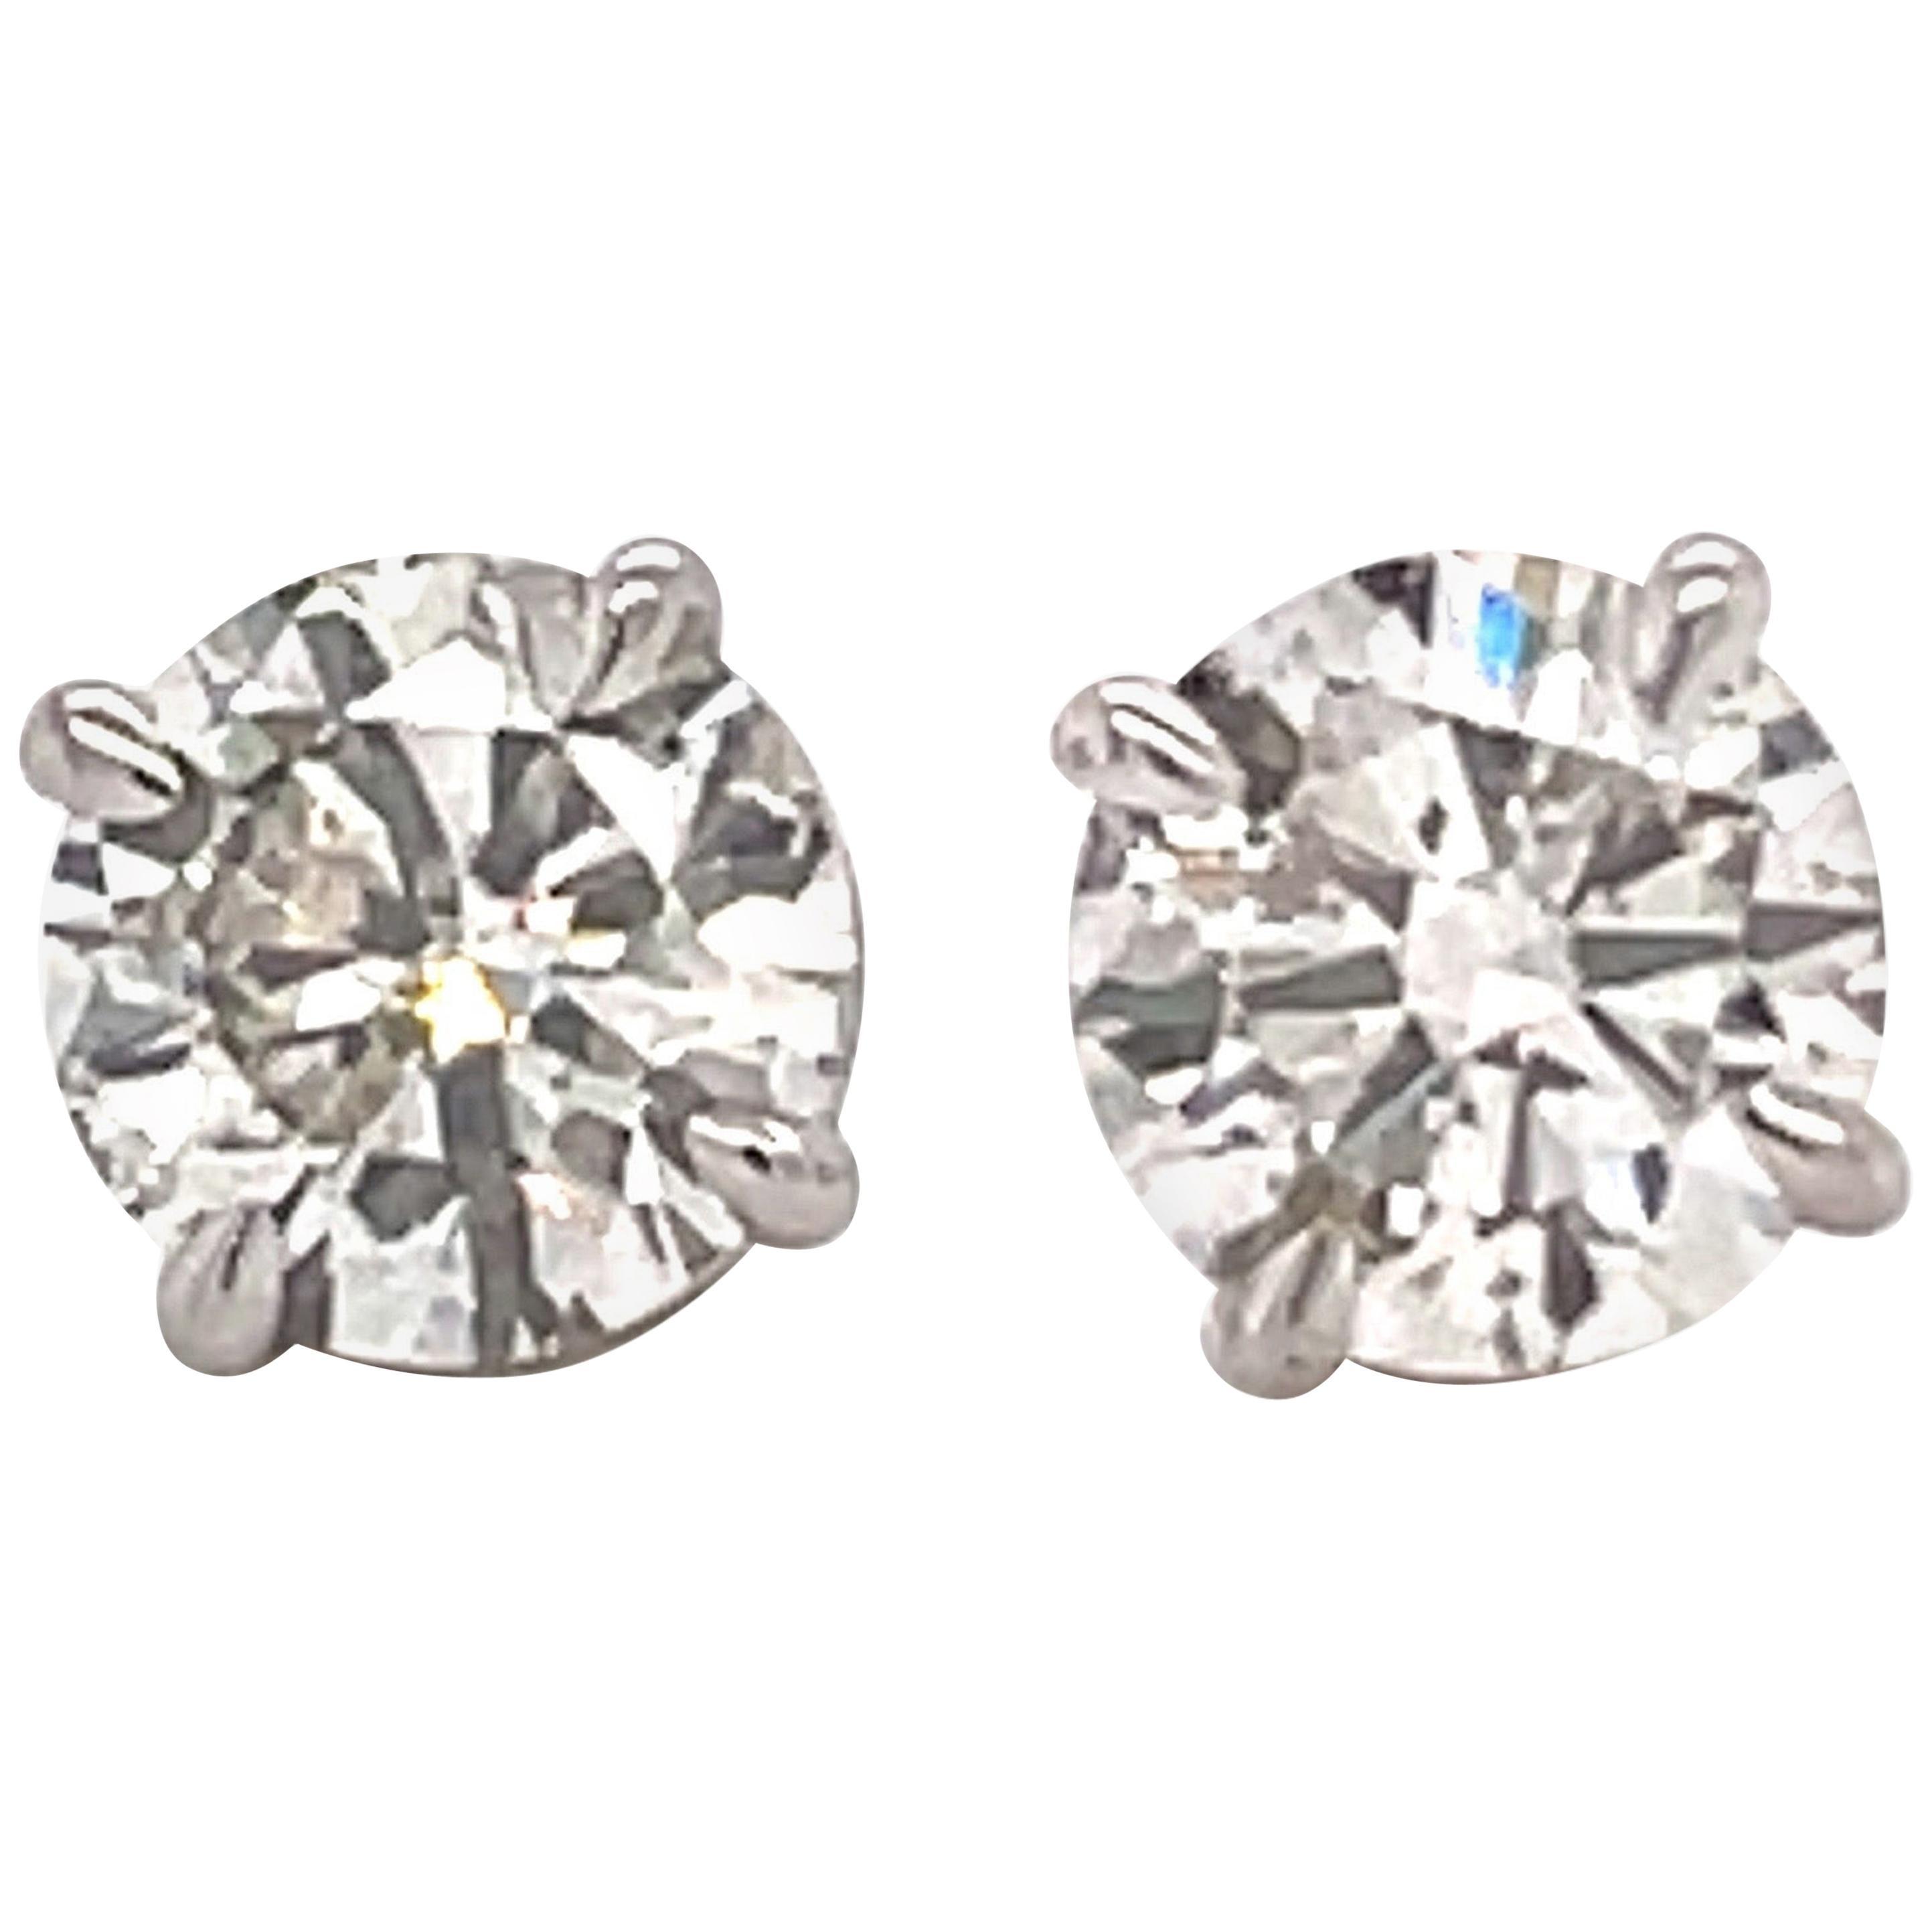 Diamond Stud Earrings 1.83 Carat J-K SI2-S13 14 Karat White Gold